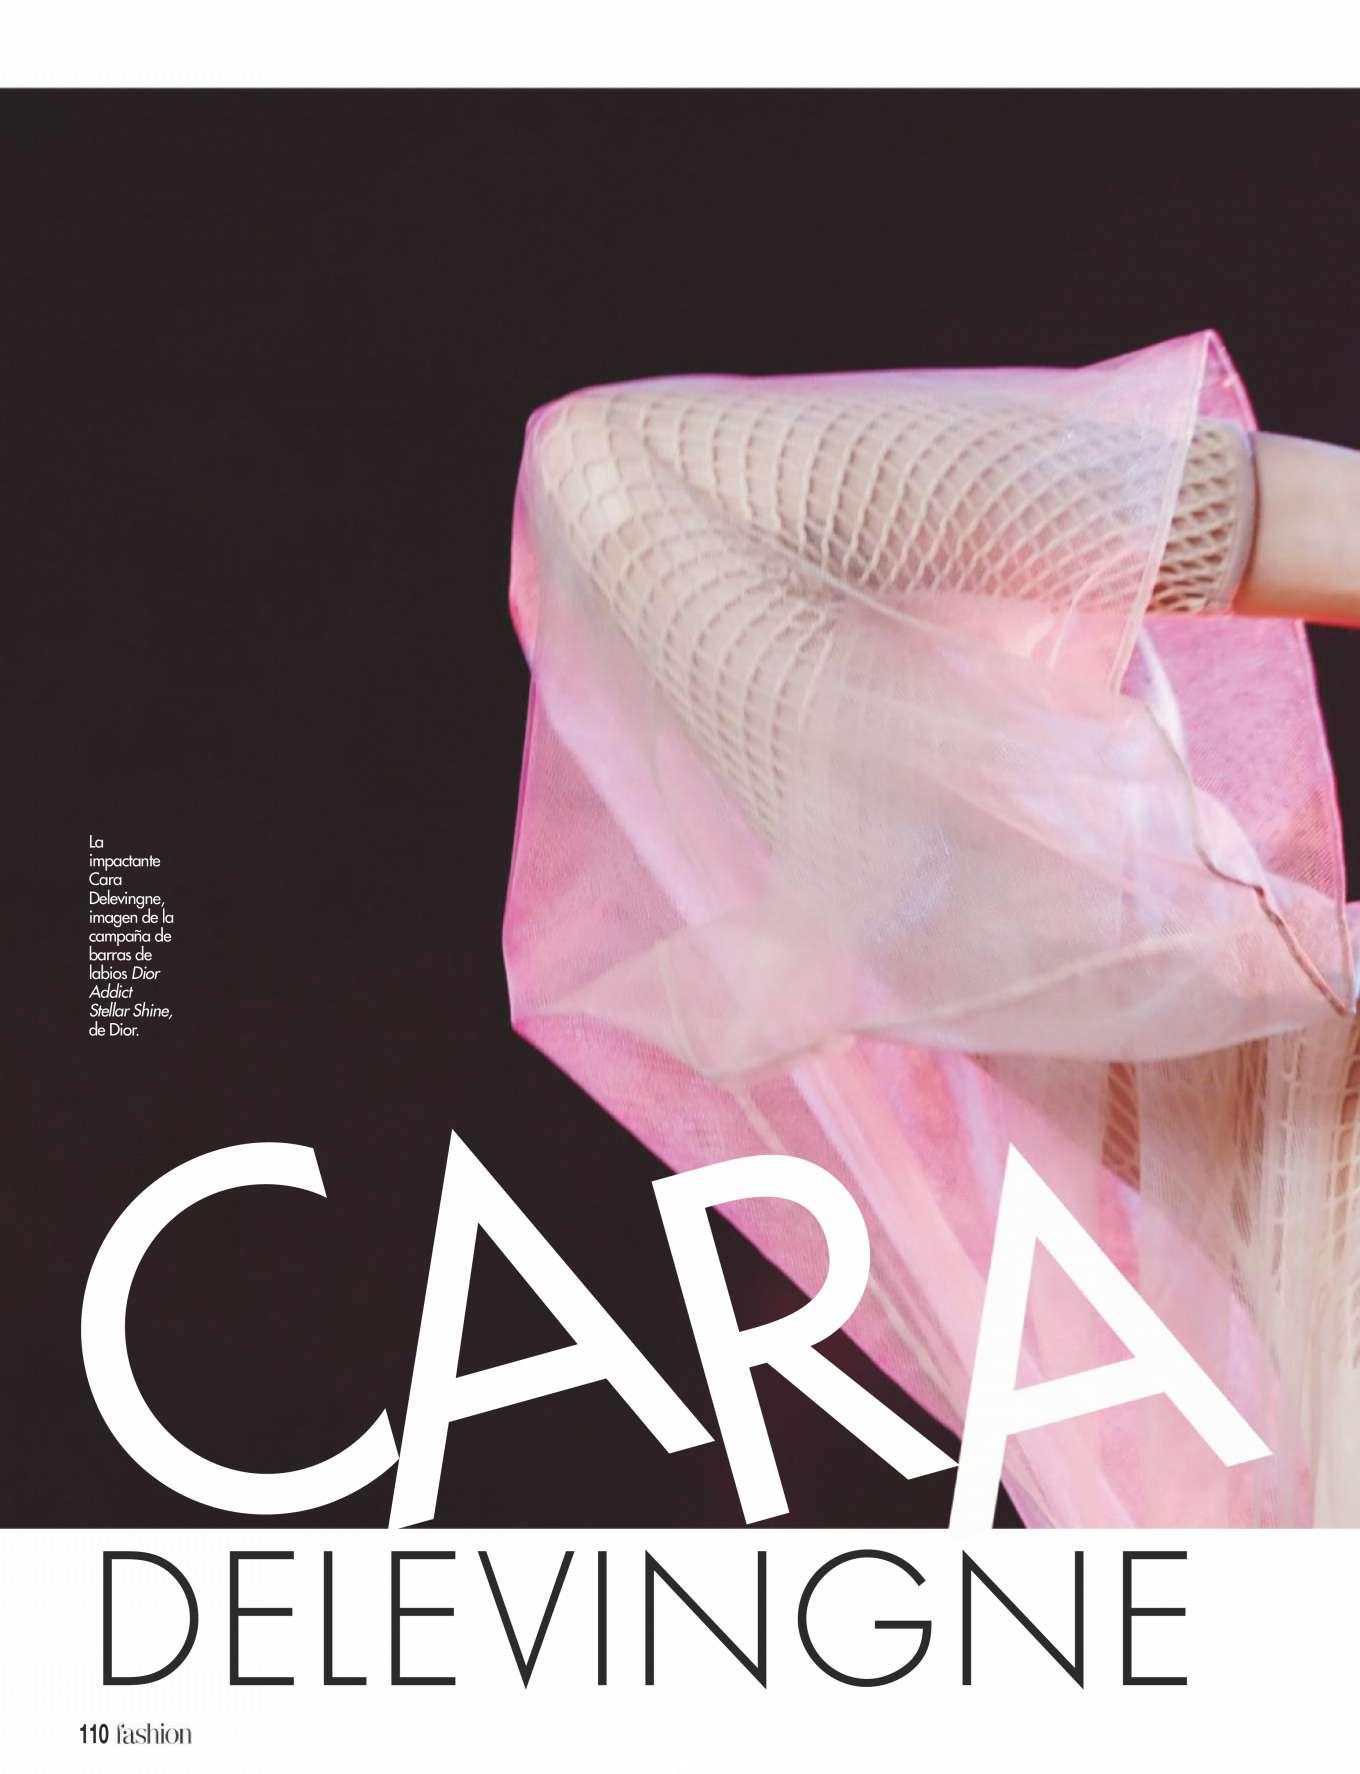 Cara Delevingne 2019 : Cara Delevingne: ¡Hola! Fashion 2019 -04